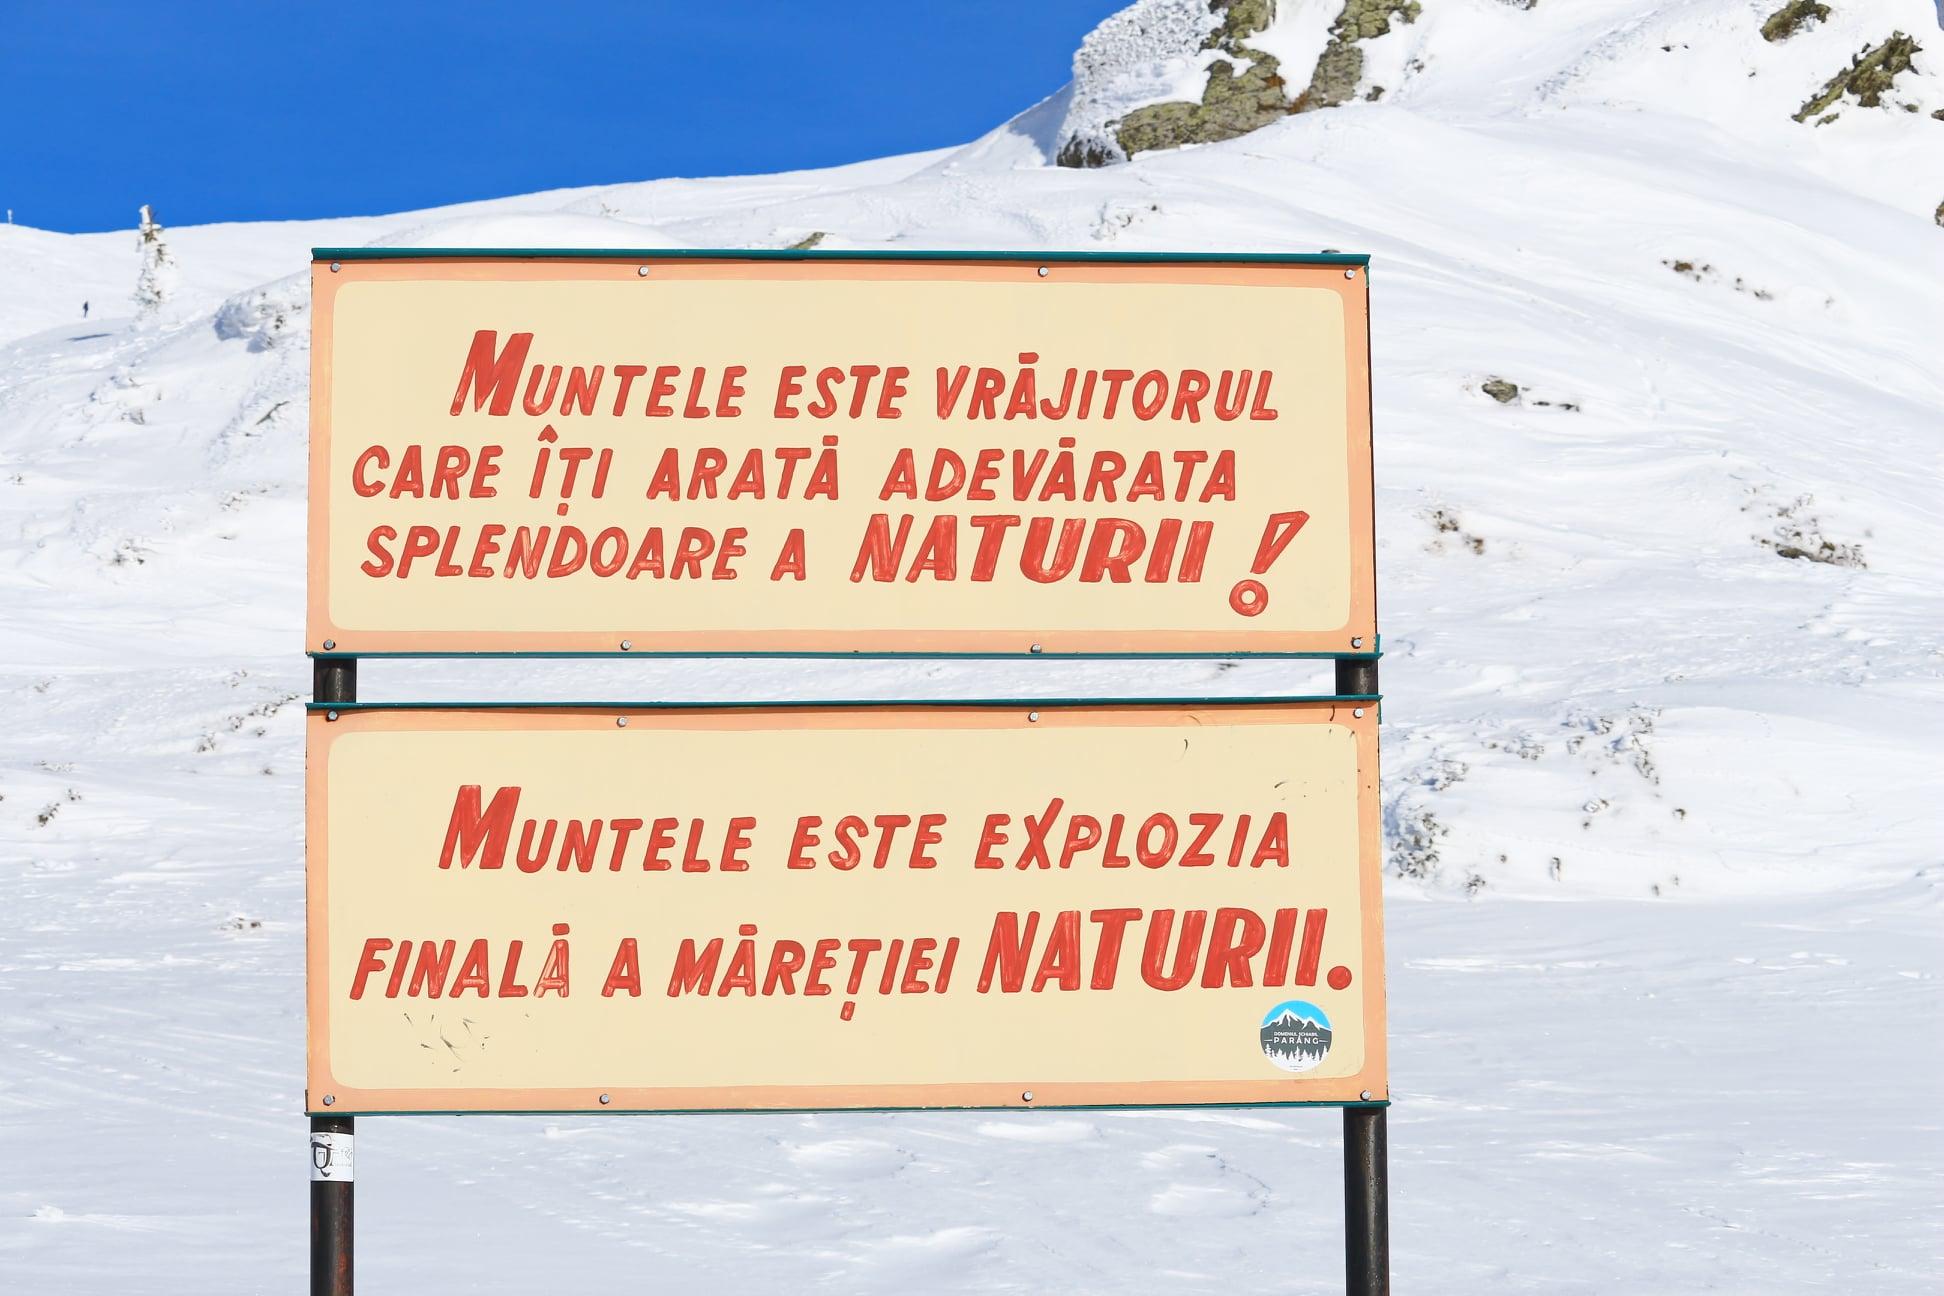 Muntele este vrajitorul - Liana Marin